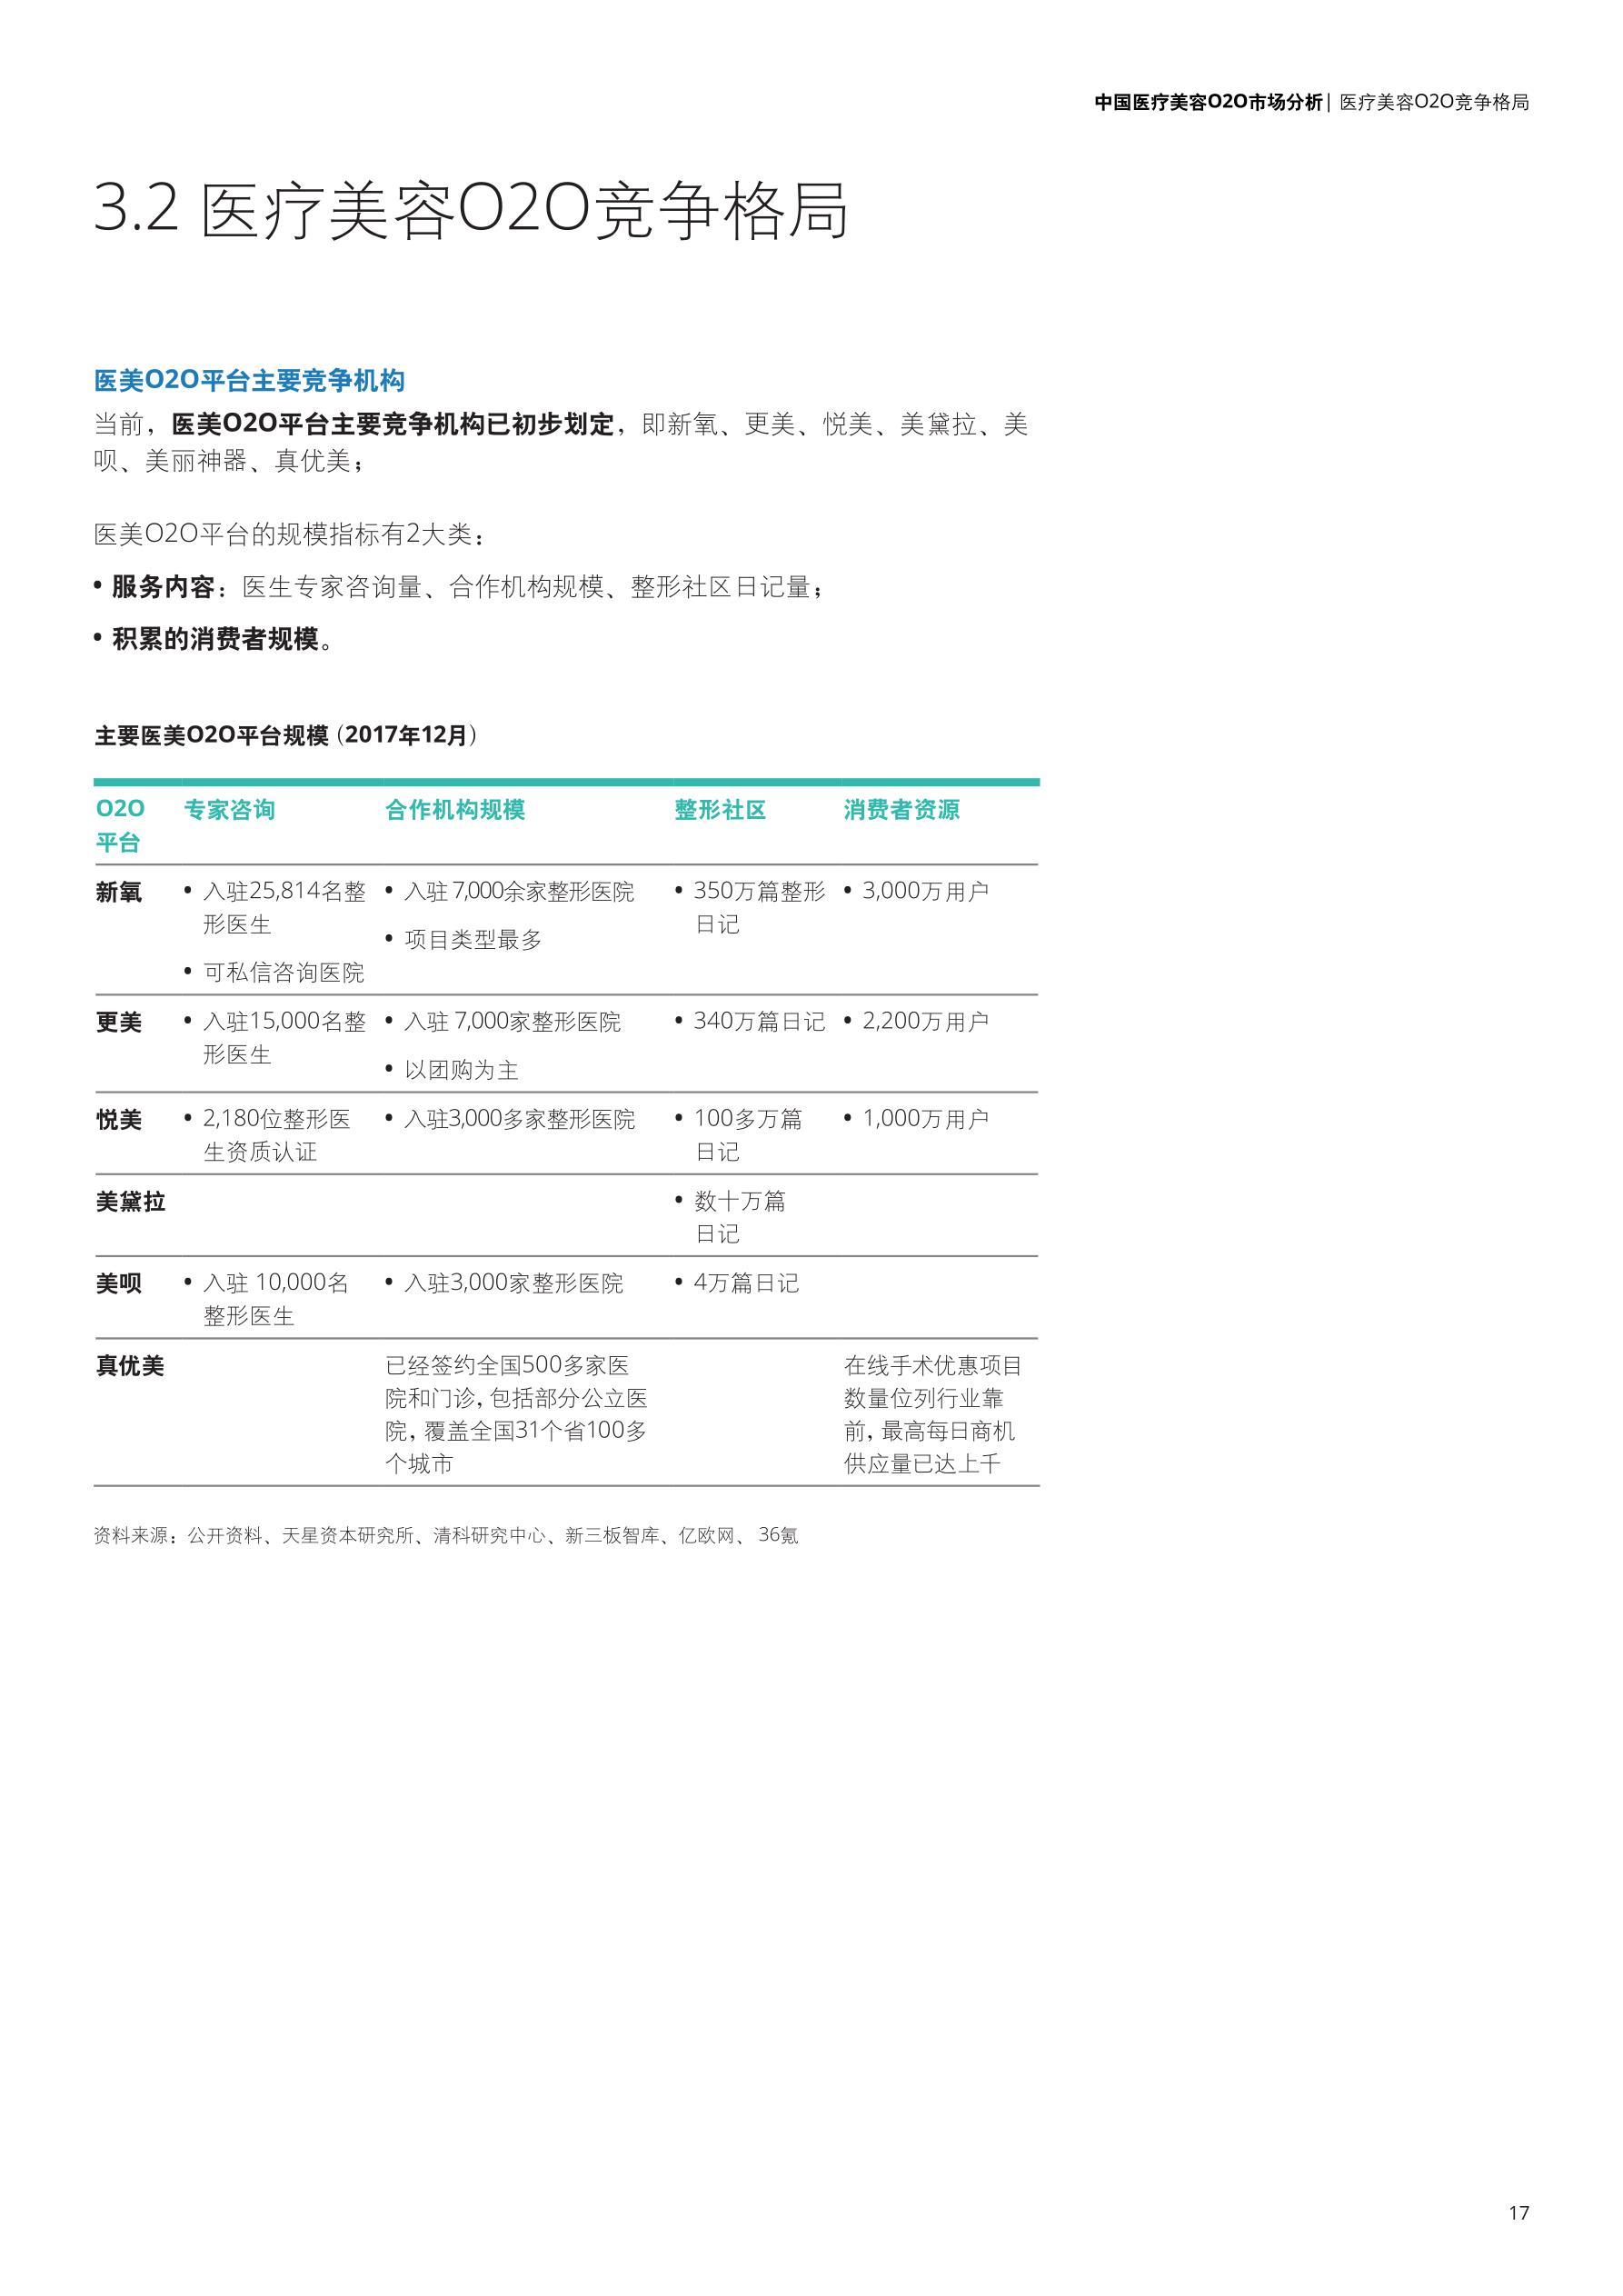 deloitte-cn-lshc-china-medical-cosmetology-o2o-market-analysis-zh-180914(1)_看图王_19